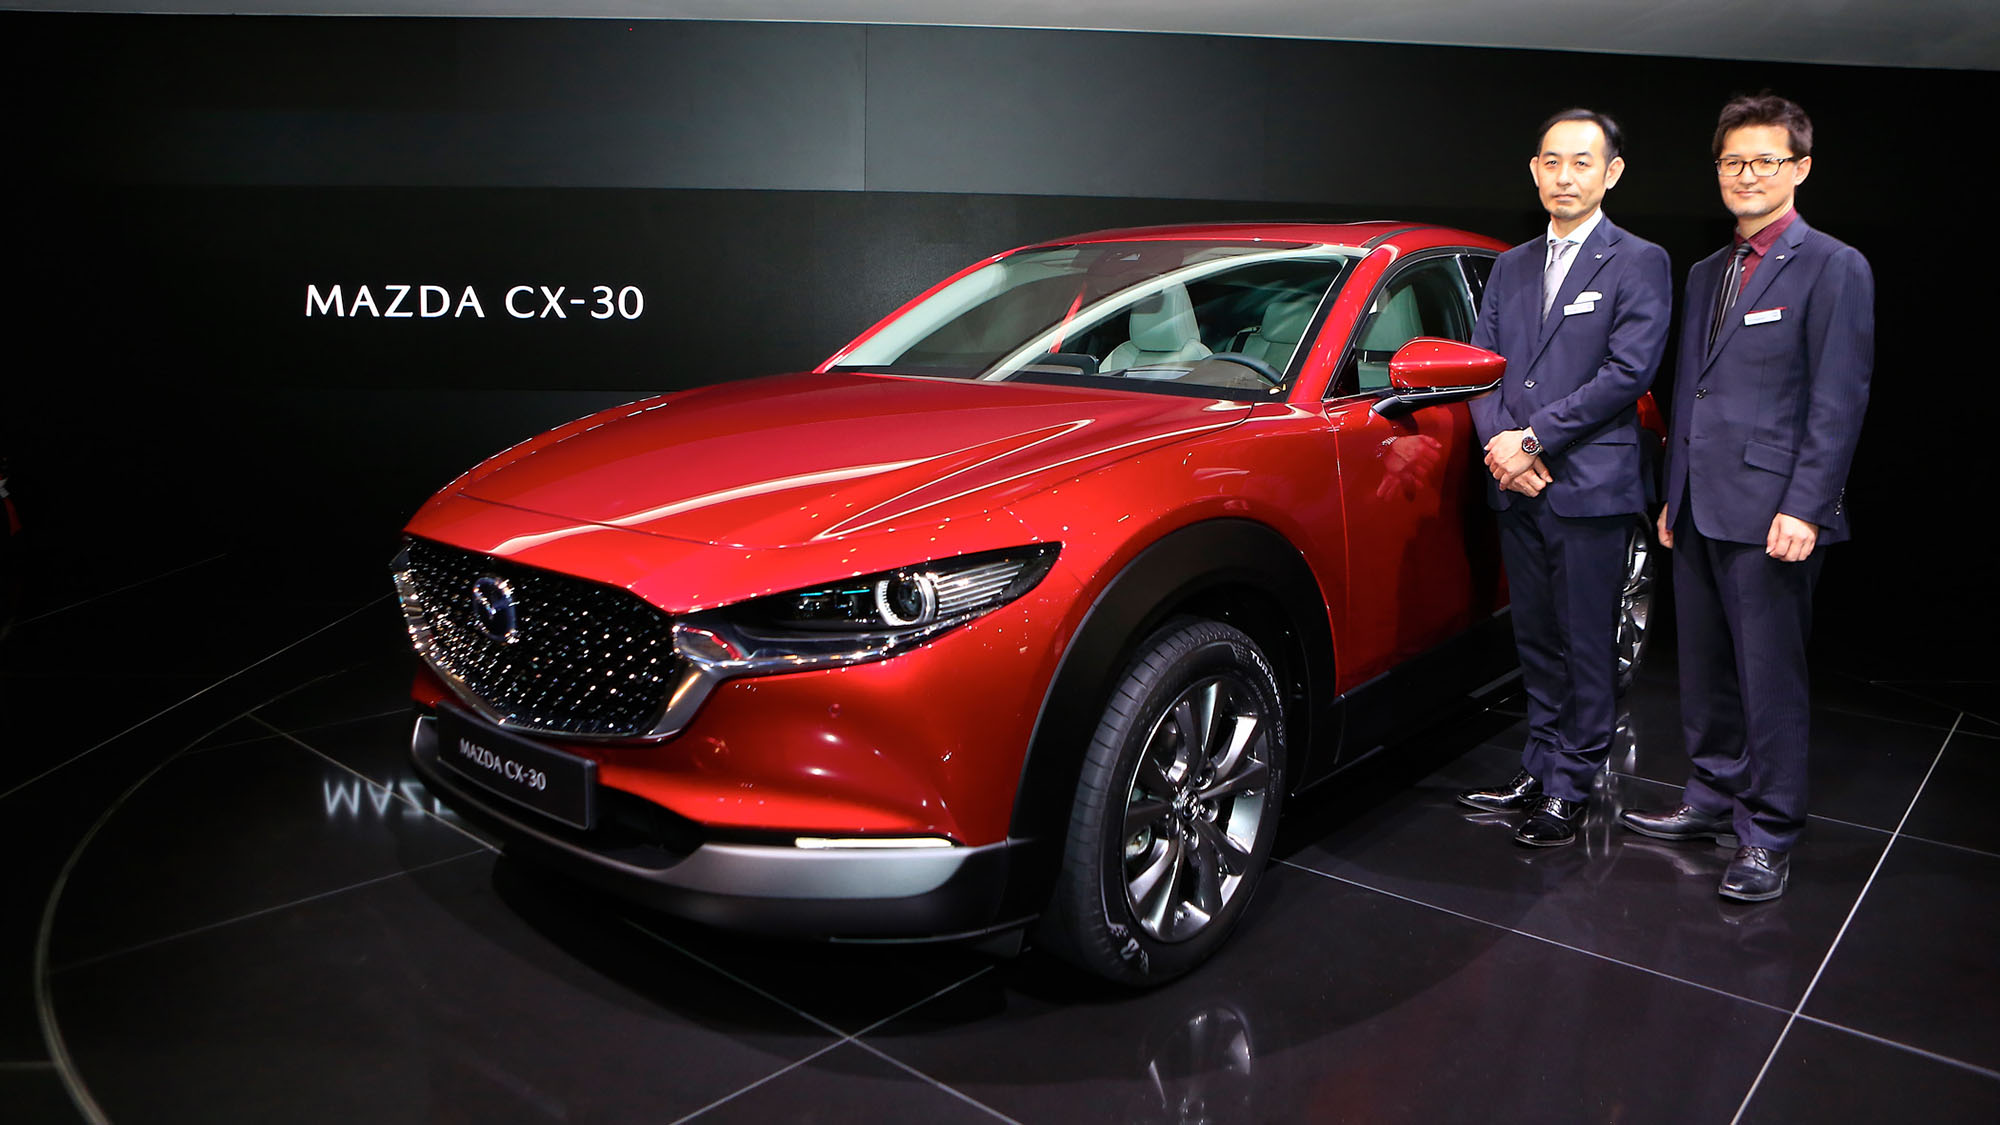 2020 Mazda CX-30: Design, Specs, Release >> 2020 Mazda Cx 30 Revealed Australian Launch Due Next Year